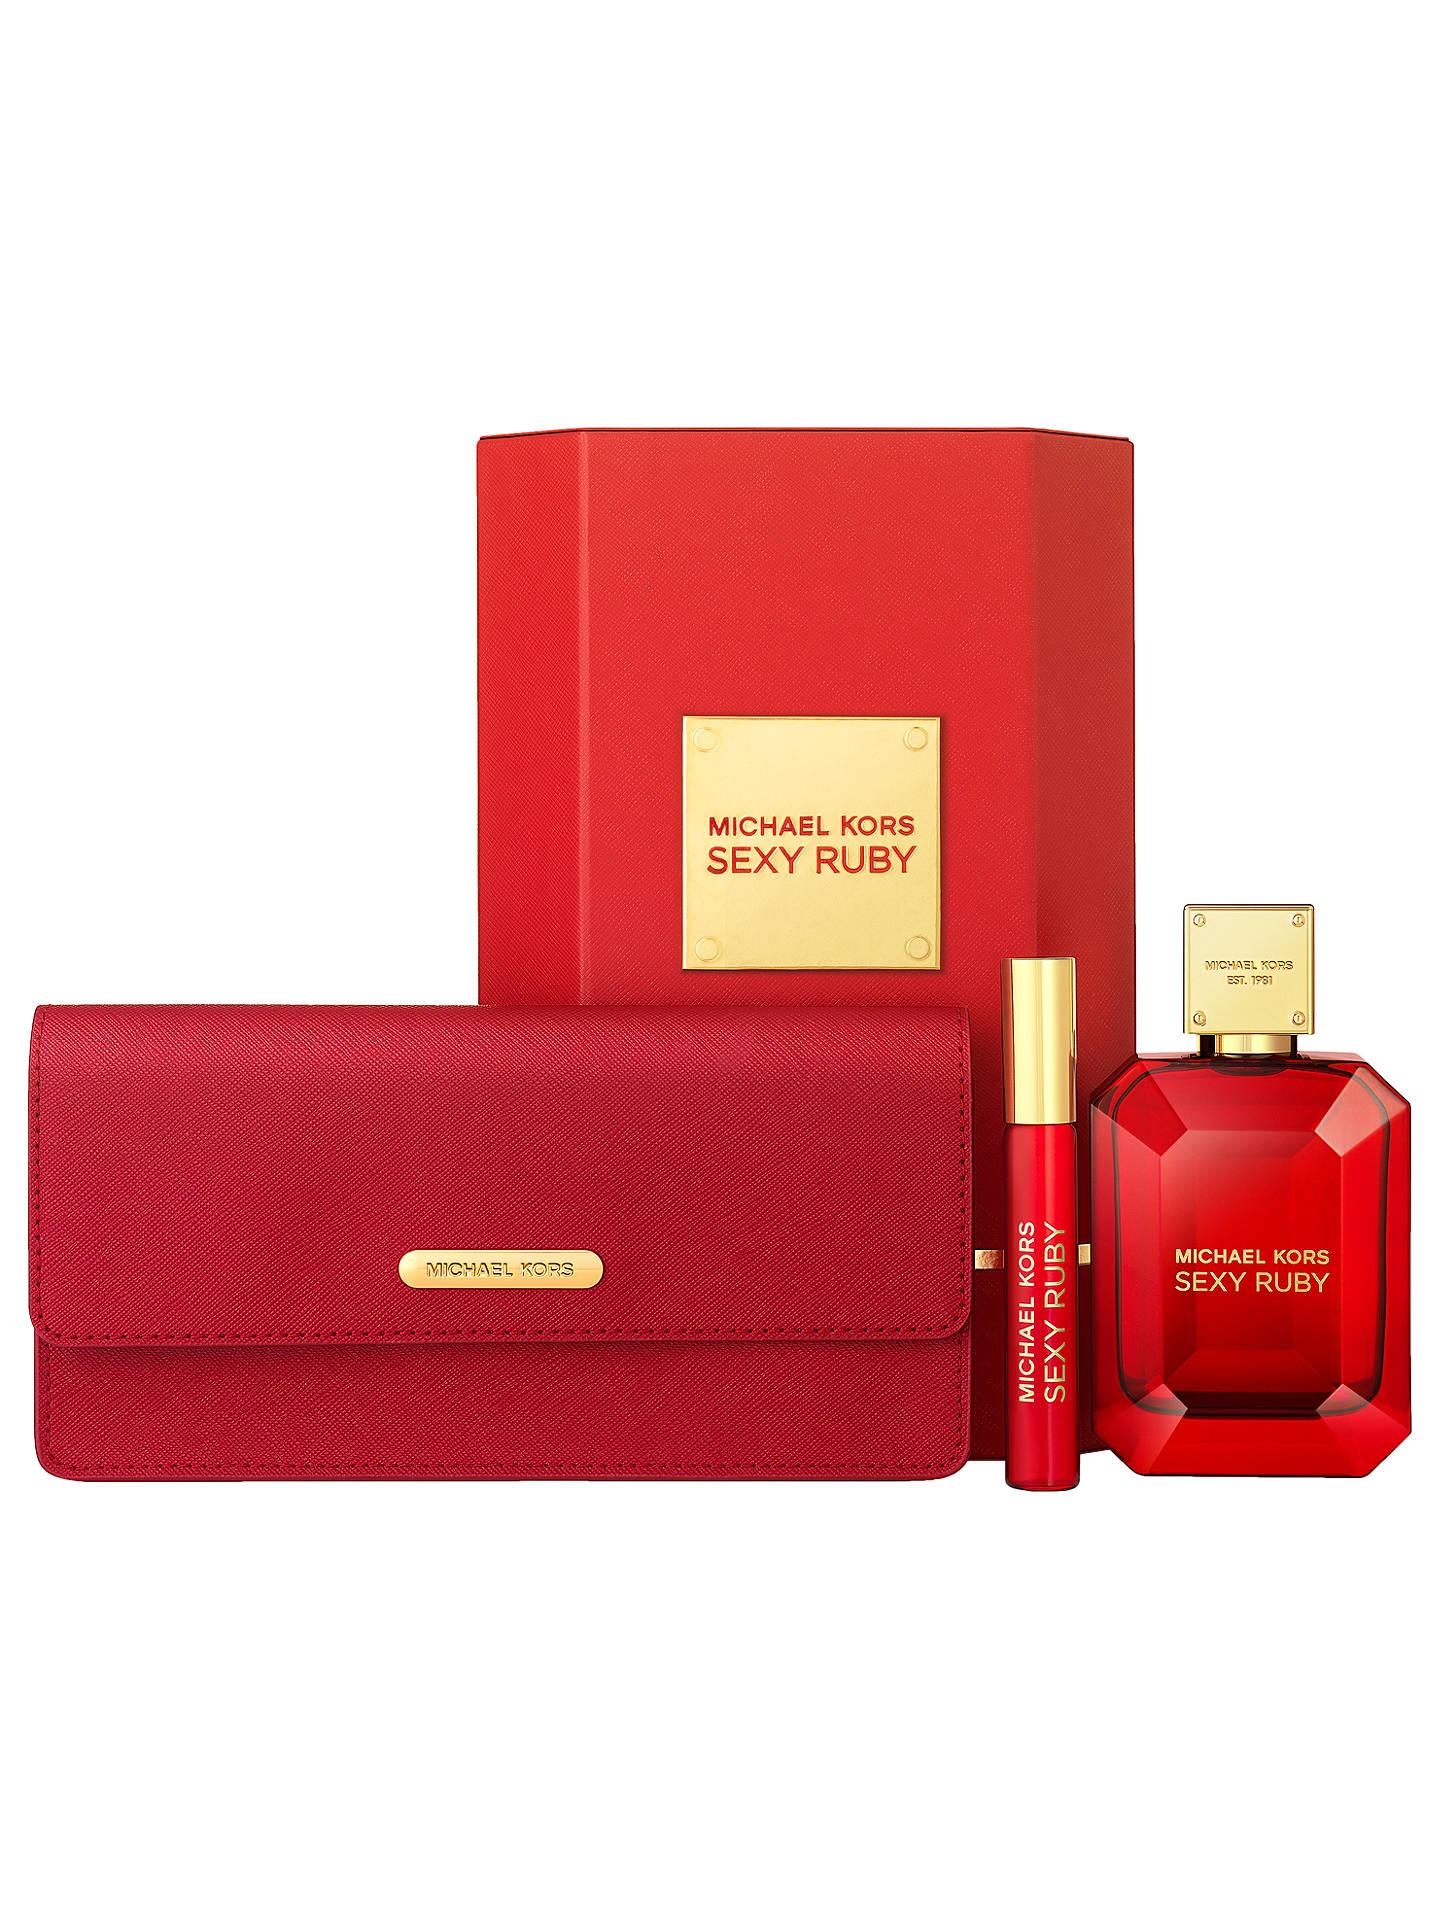 e90dfd51cfeb9 Buy Michael Kors Sexy Ruby 100ml Eau de Parfum with Clutch Bag Fragrance  Gift Set Online ...